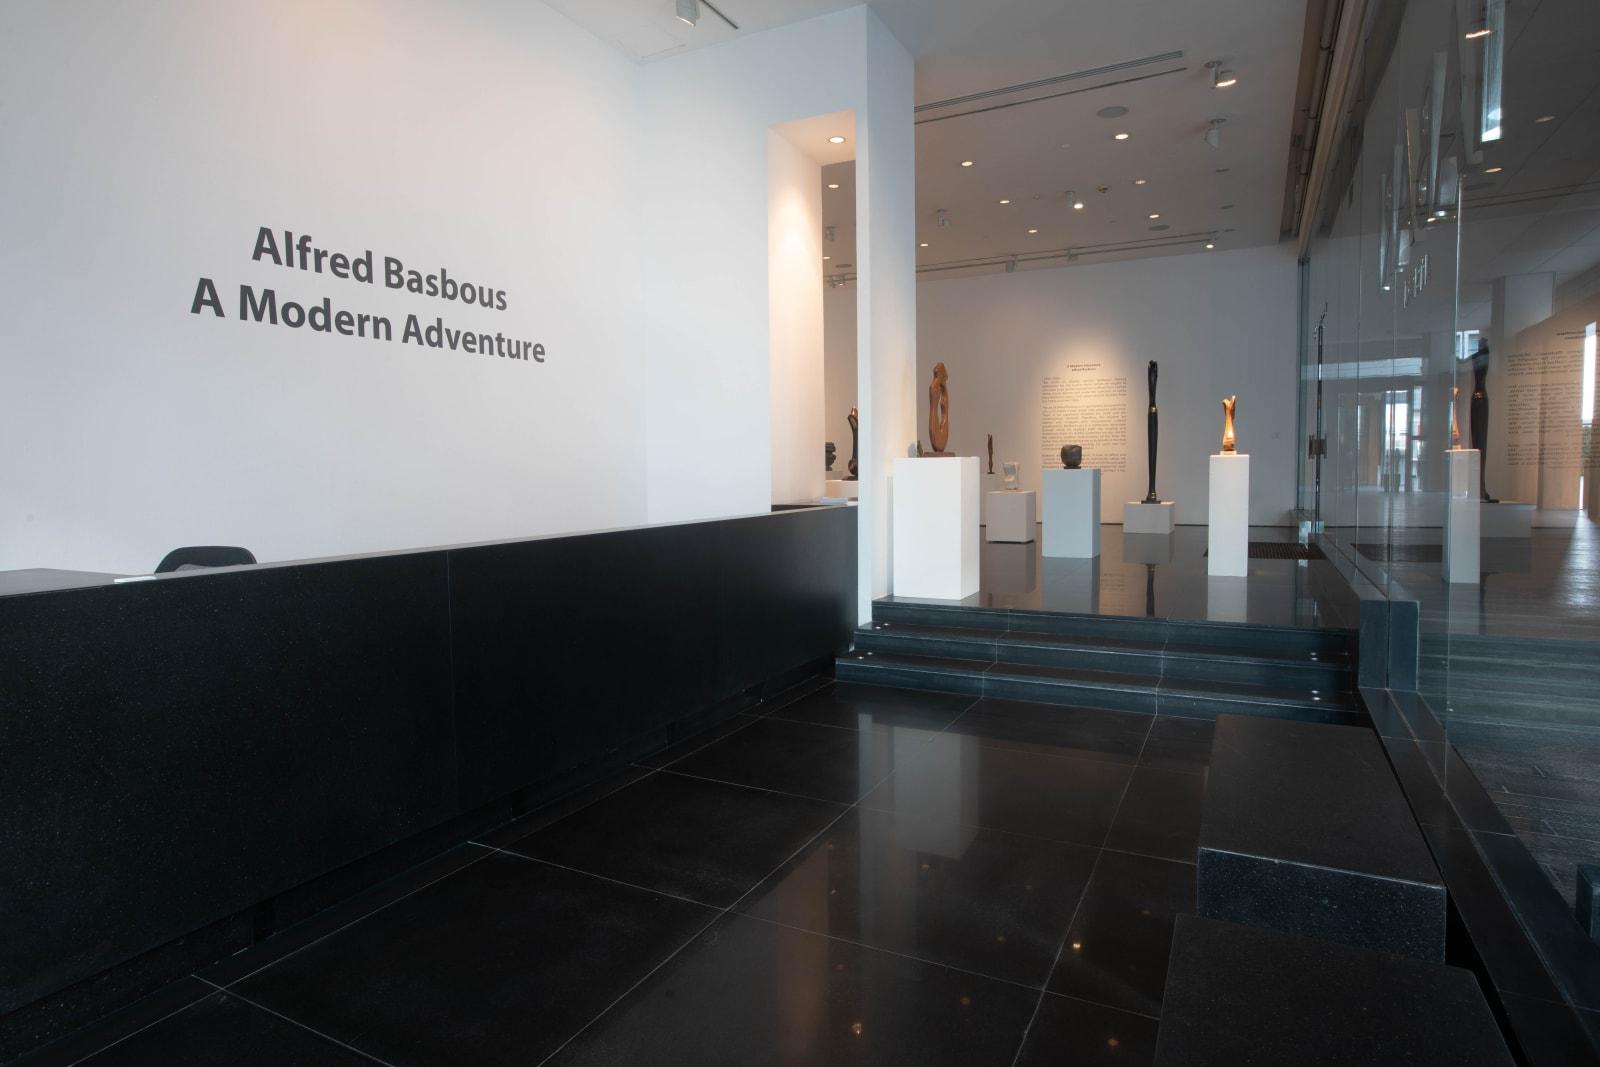 Alfred Basbous: A Modern Adventure